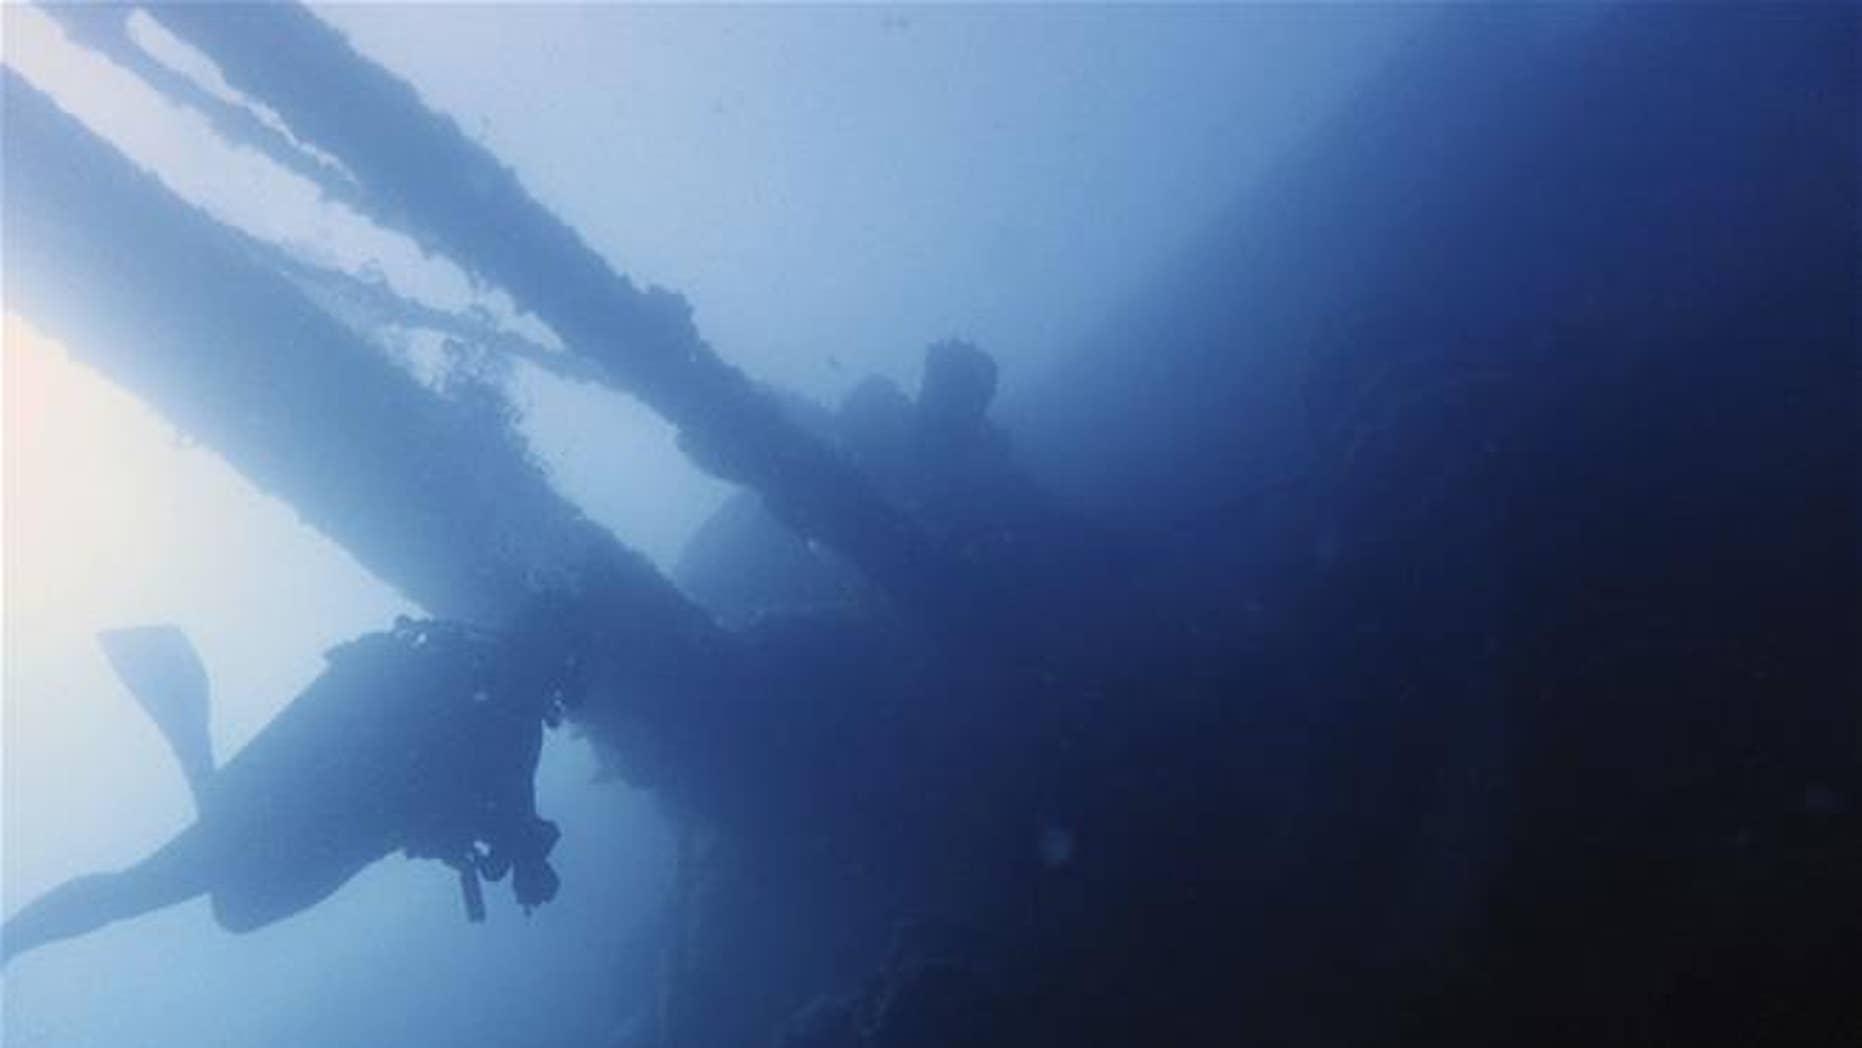 A diver swims under part of the Italian World War II shipwreck MV Probitas in a bay near Saranda, Albania.